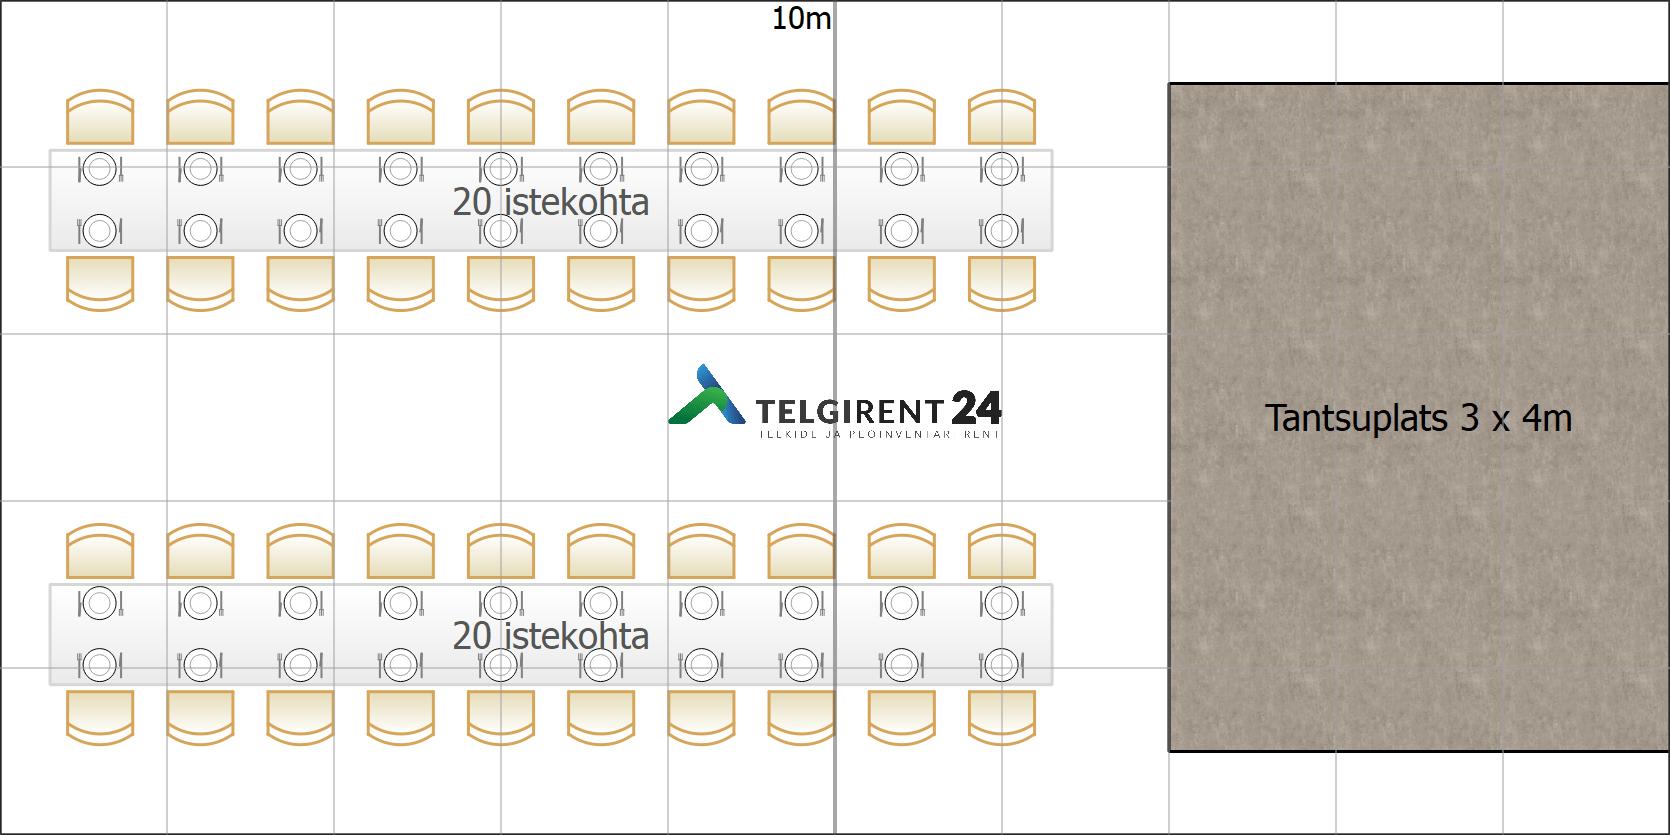 Peotelk 5 x 10m (40 inimest + tantsuplats)